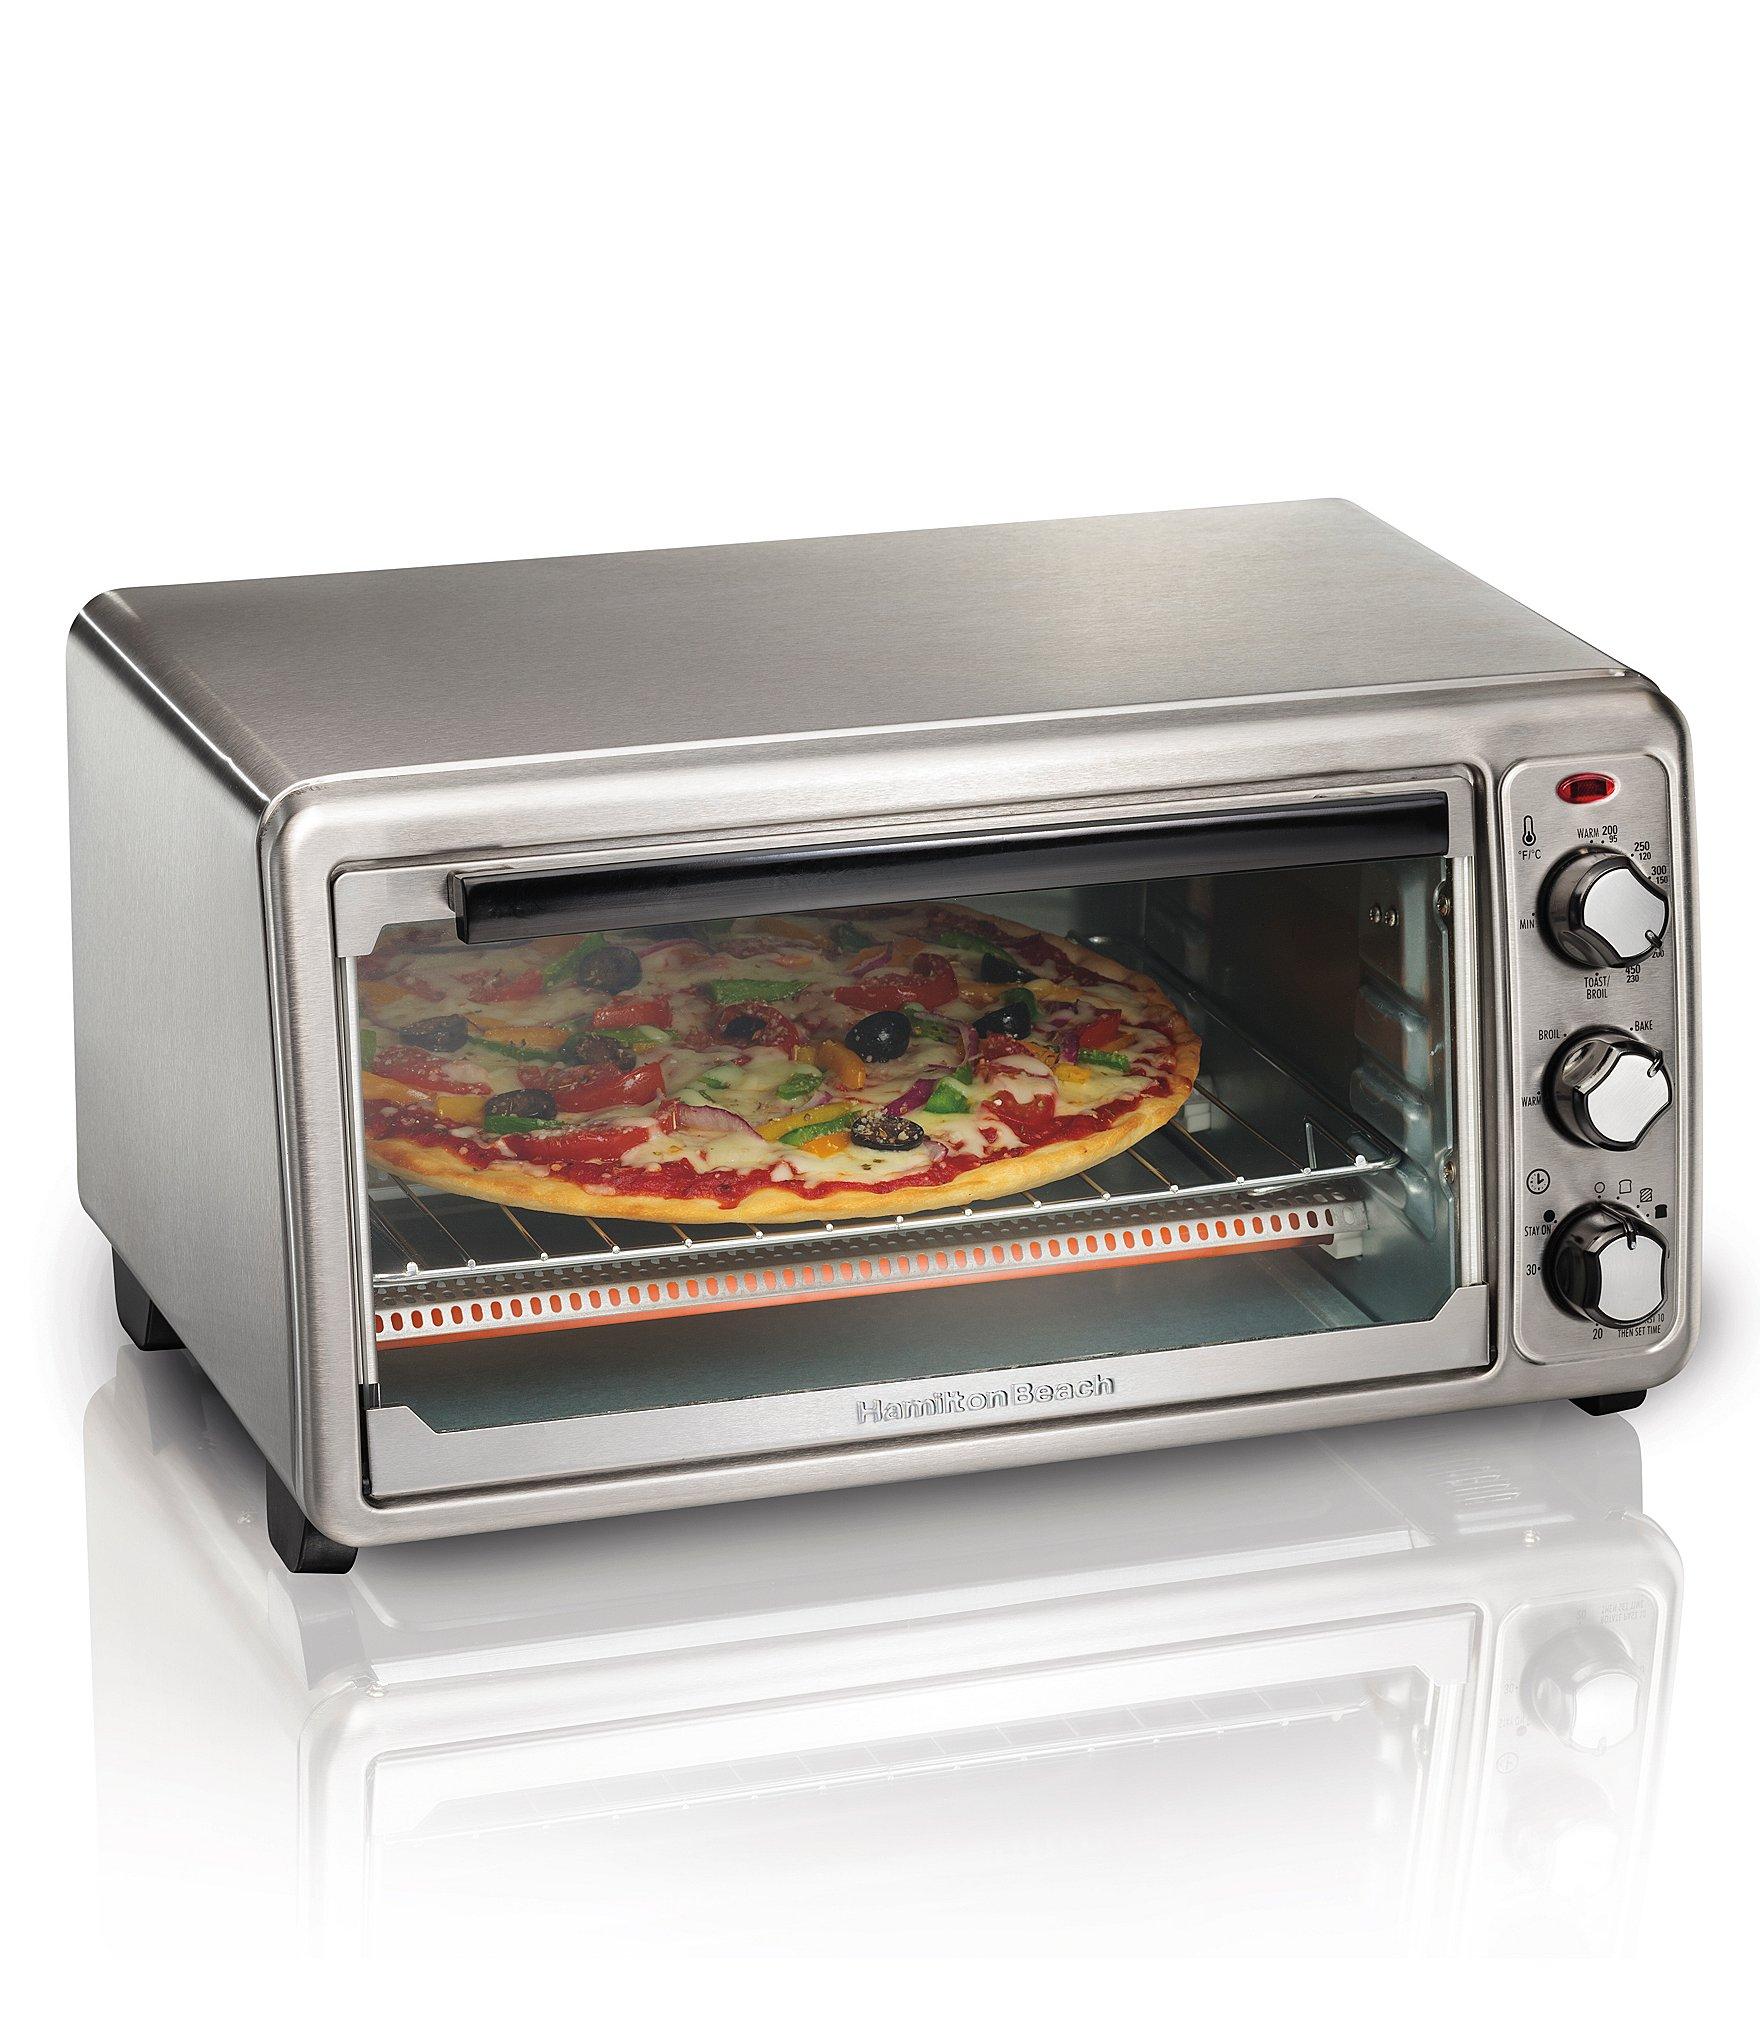 Hamilton beach 6 slice stainless steel toaster oven dillards for Hamilton beach pioneer woman slow cooker